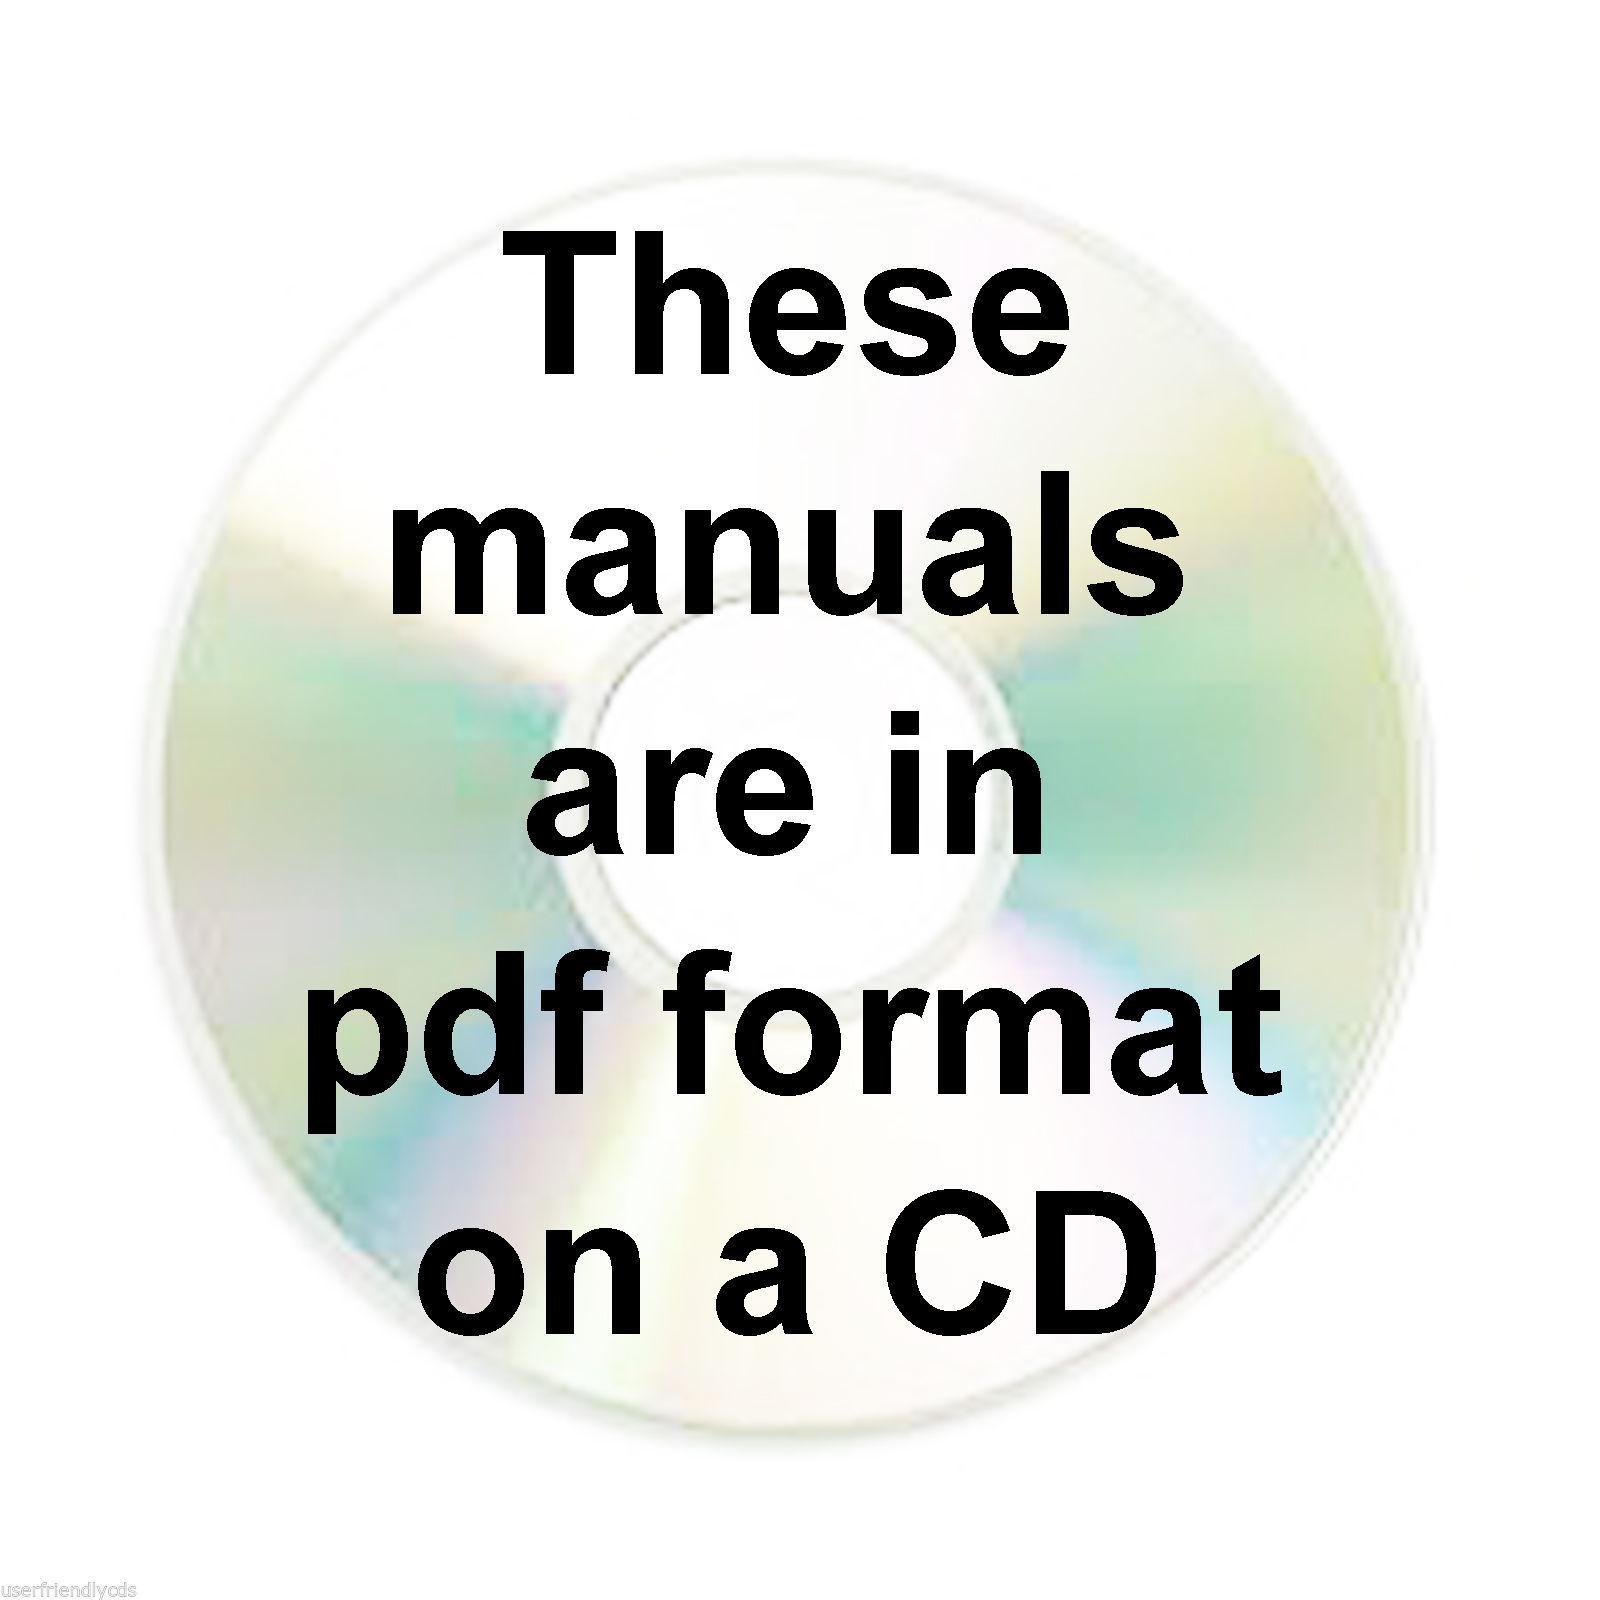 YANMAR L-A Engine SERVICE MANUAL & Parts Catalogs & Operator -4- MANUALS CD image 2